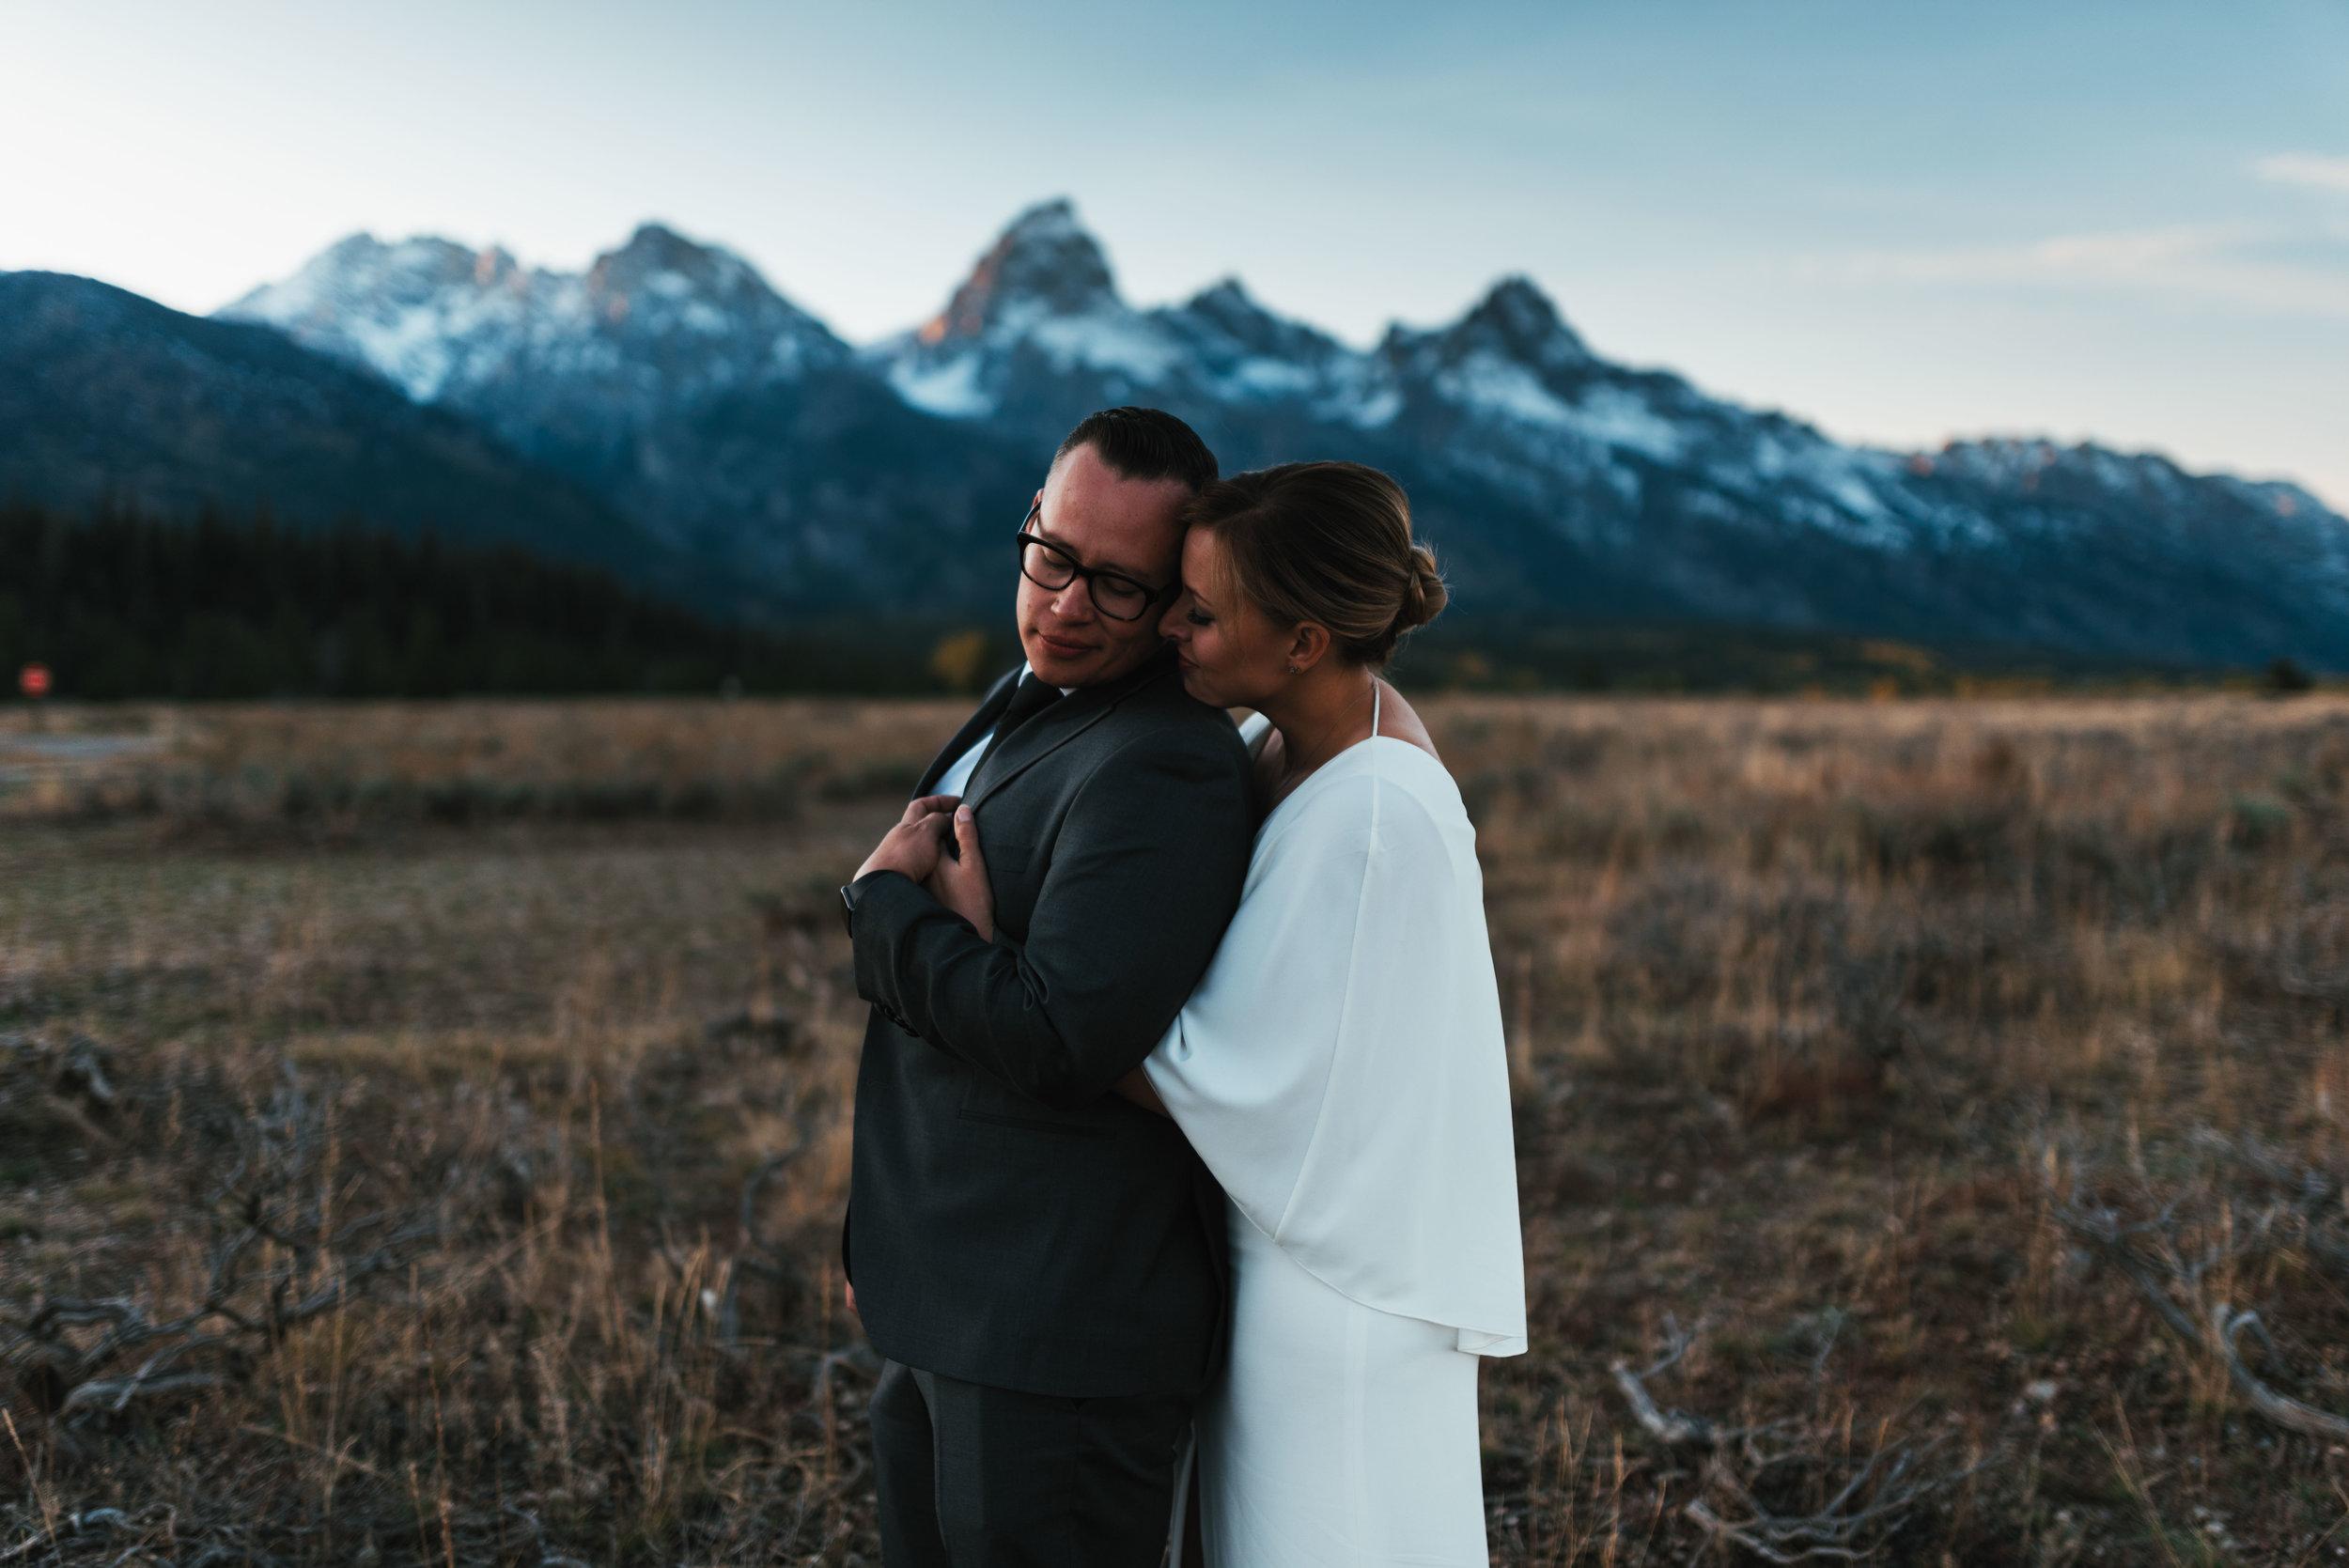 Jackson_Hole_Wedding_Photography_Wyoming_Elopement_Destination_Wedding_Photographer-28.jpg